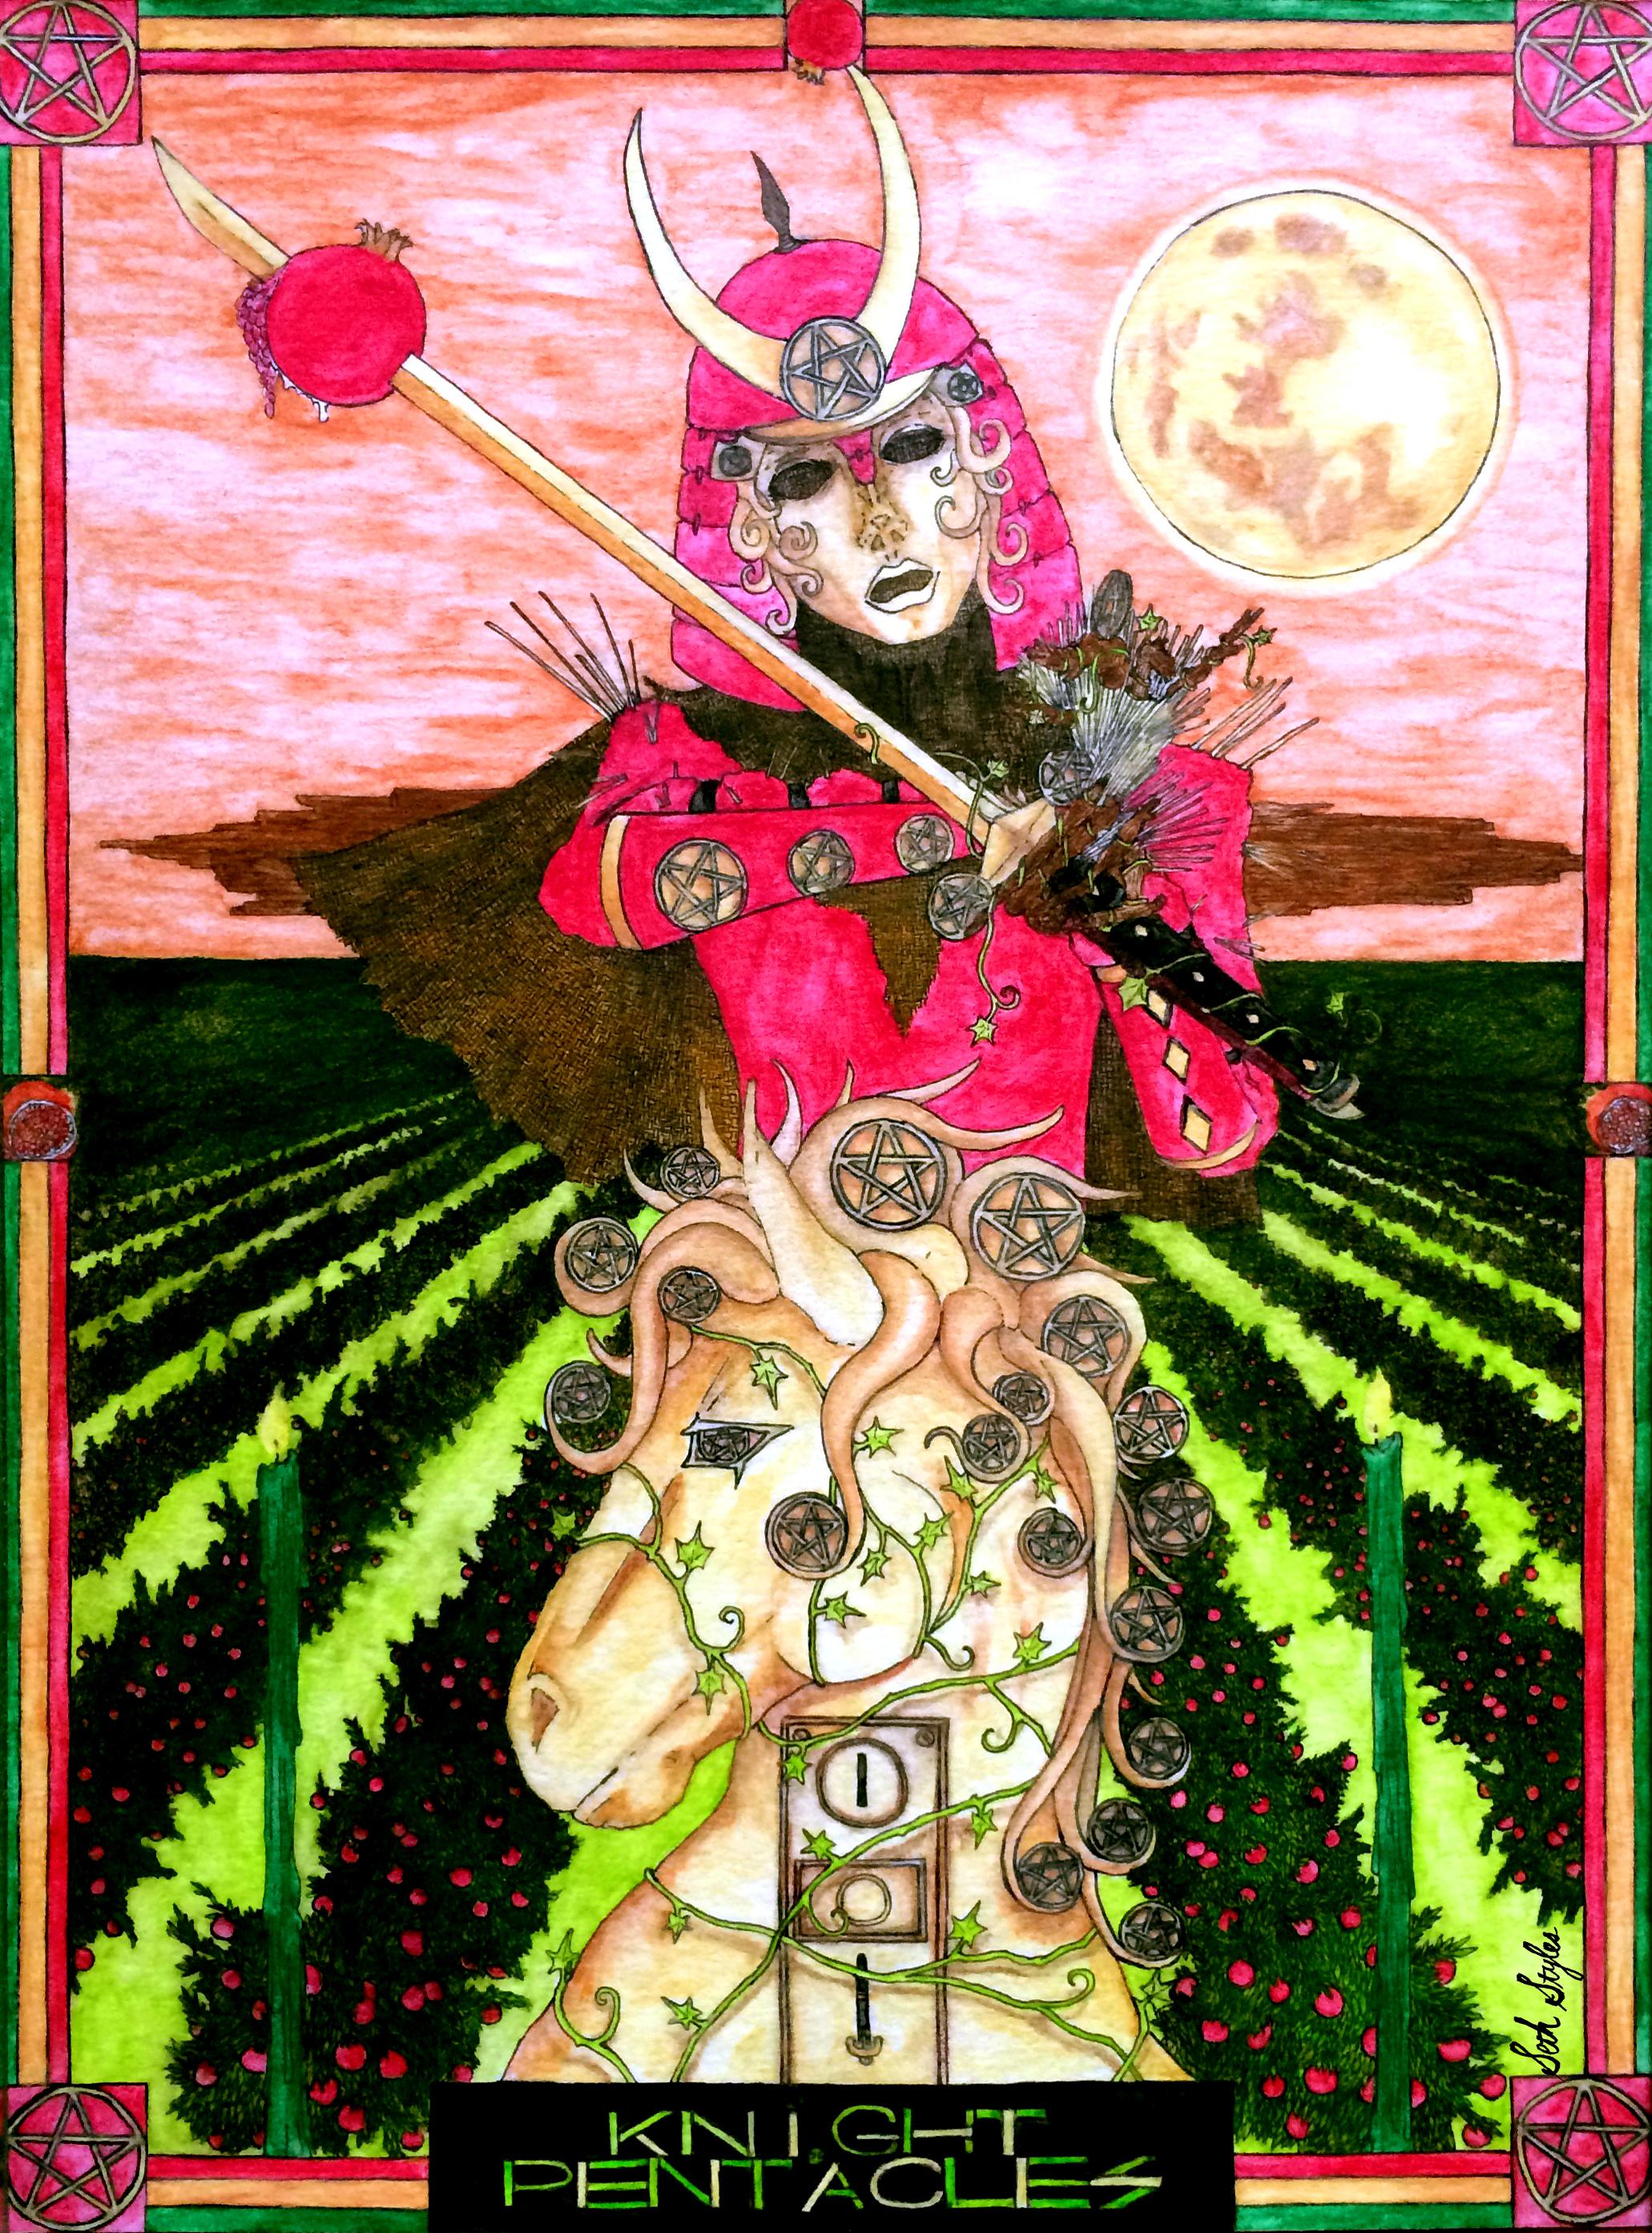 knight-of-pentacles-tarot-occult-seth-styles-minor-arcana-samurai-scarecrow-money-success-abundance